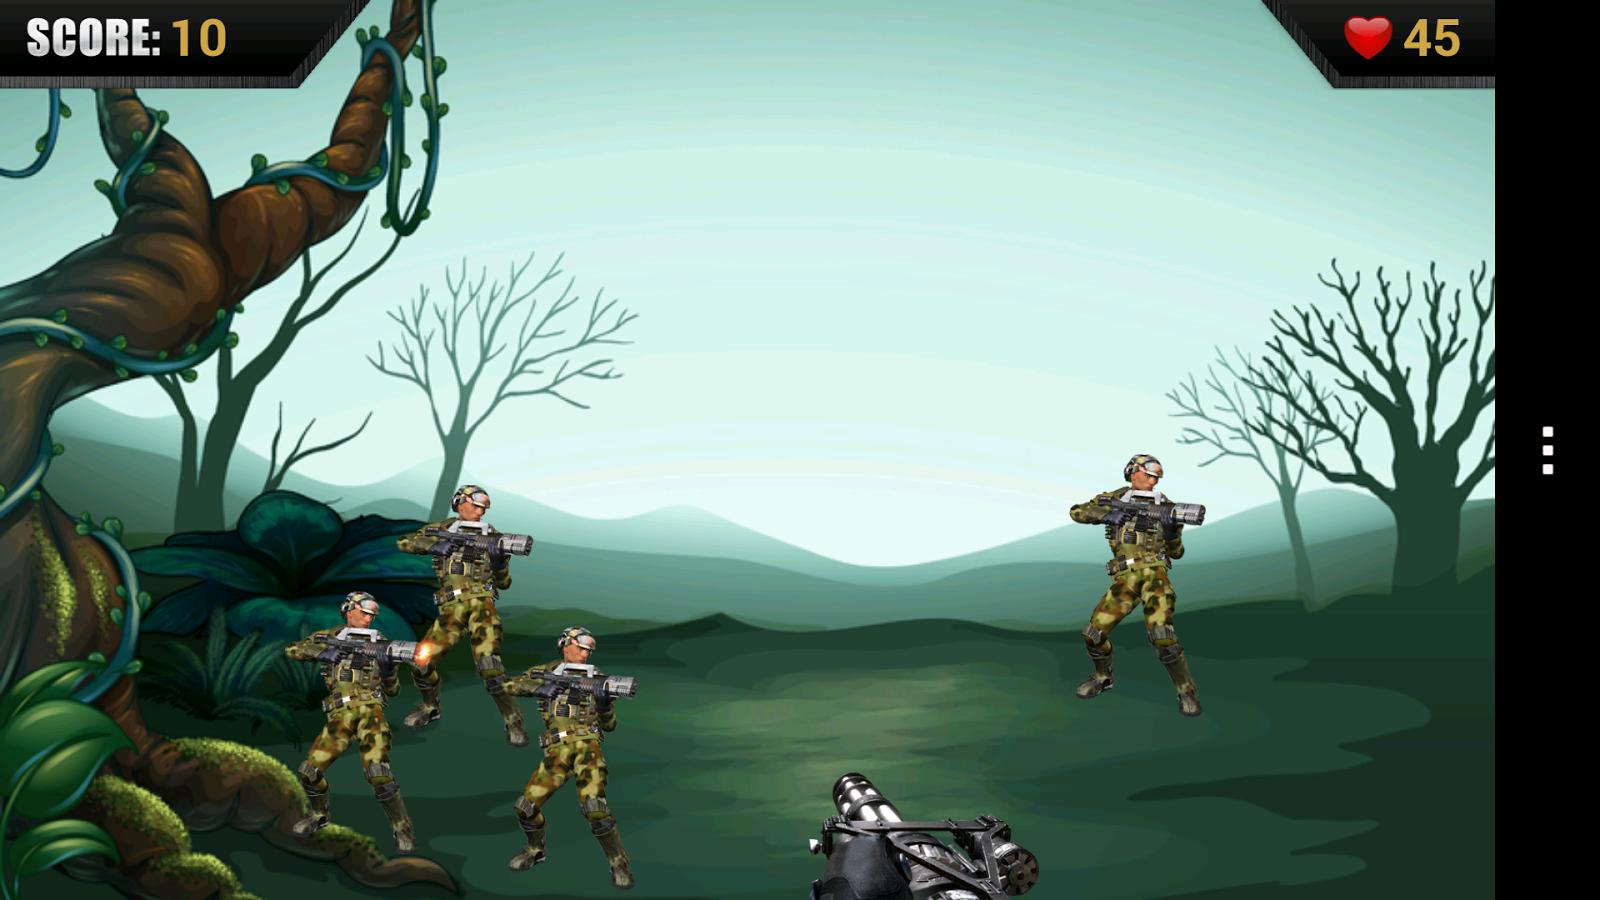 Minigun-Massacre 4